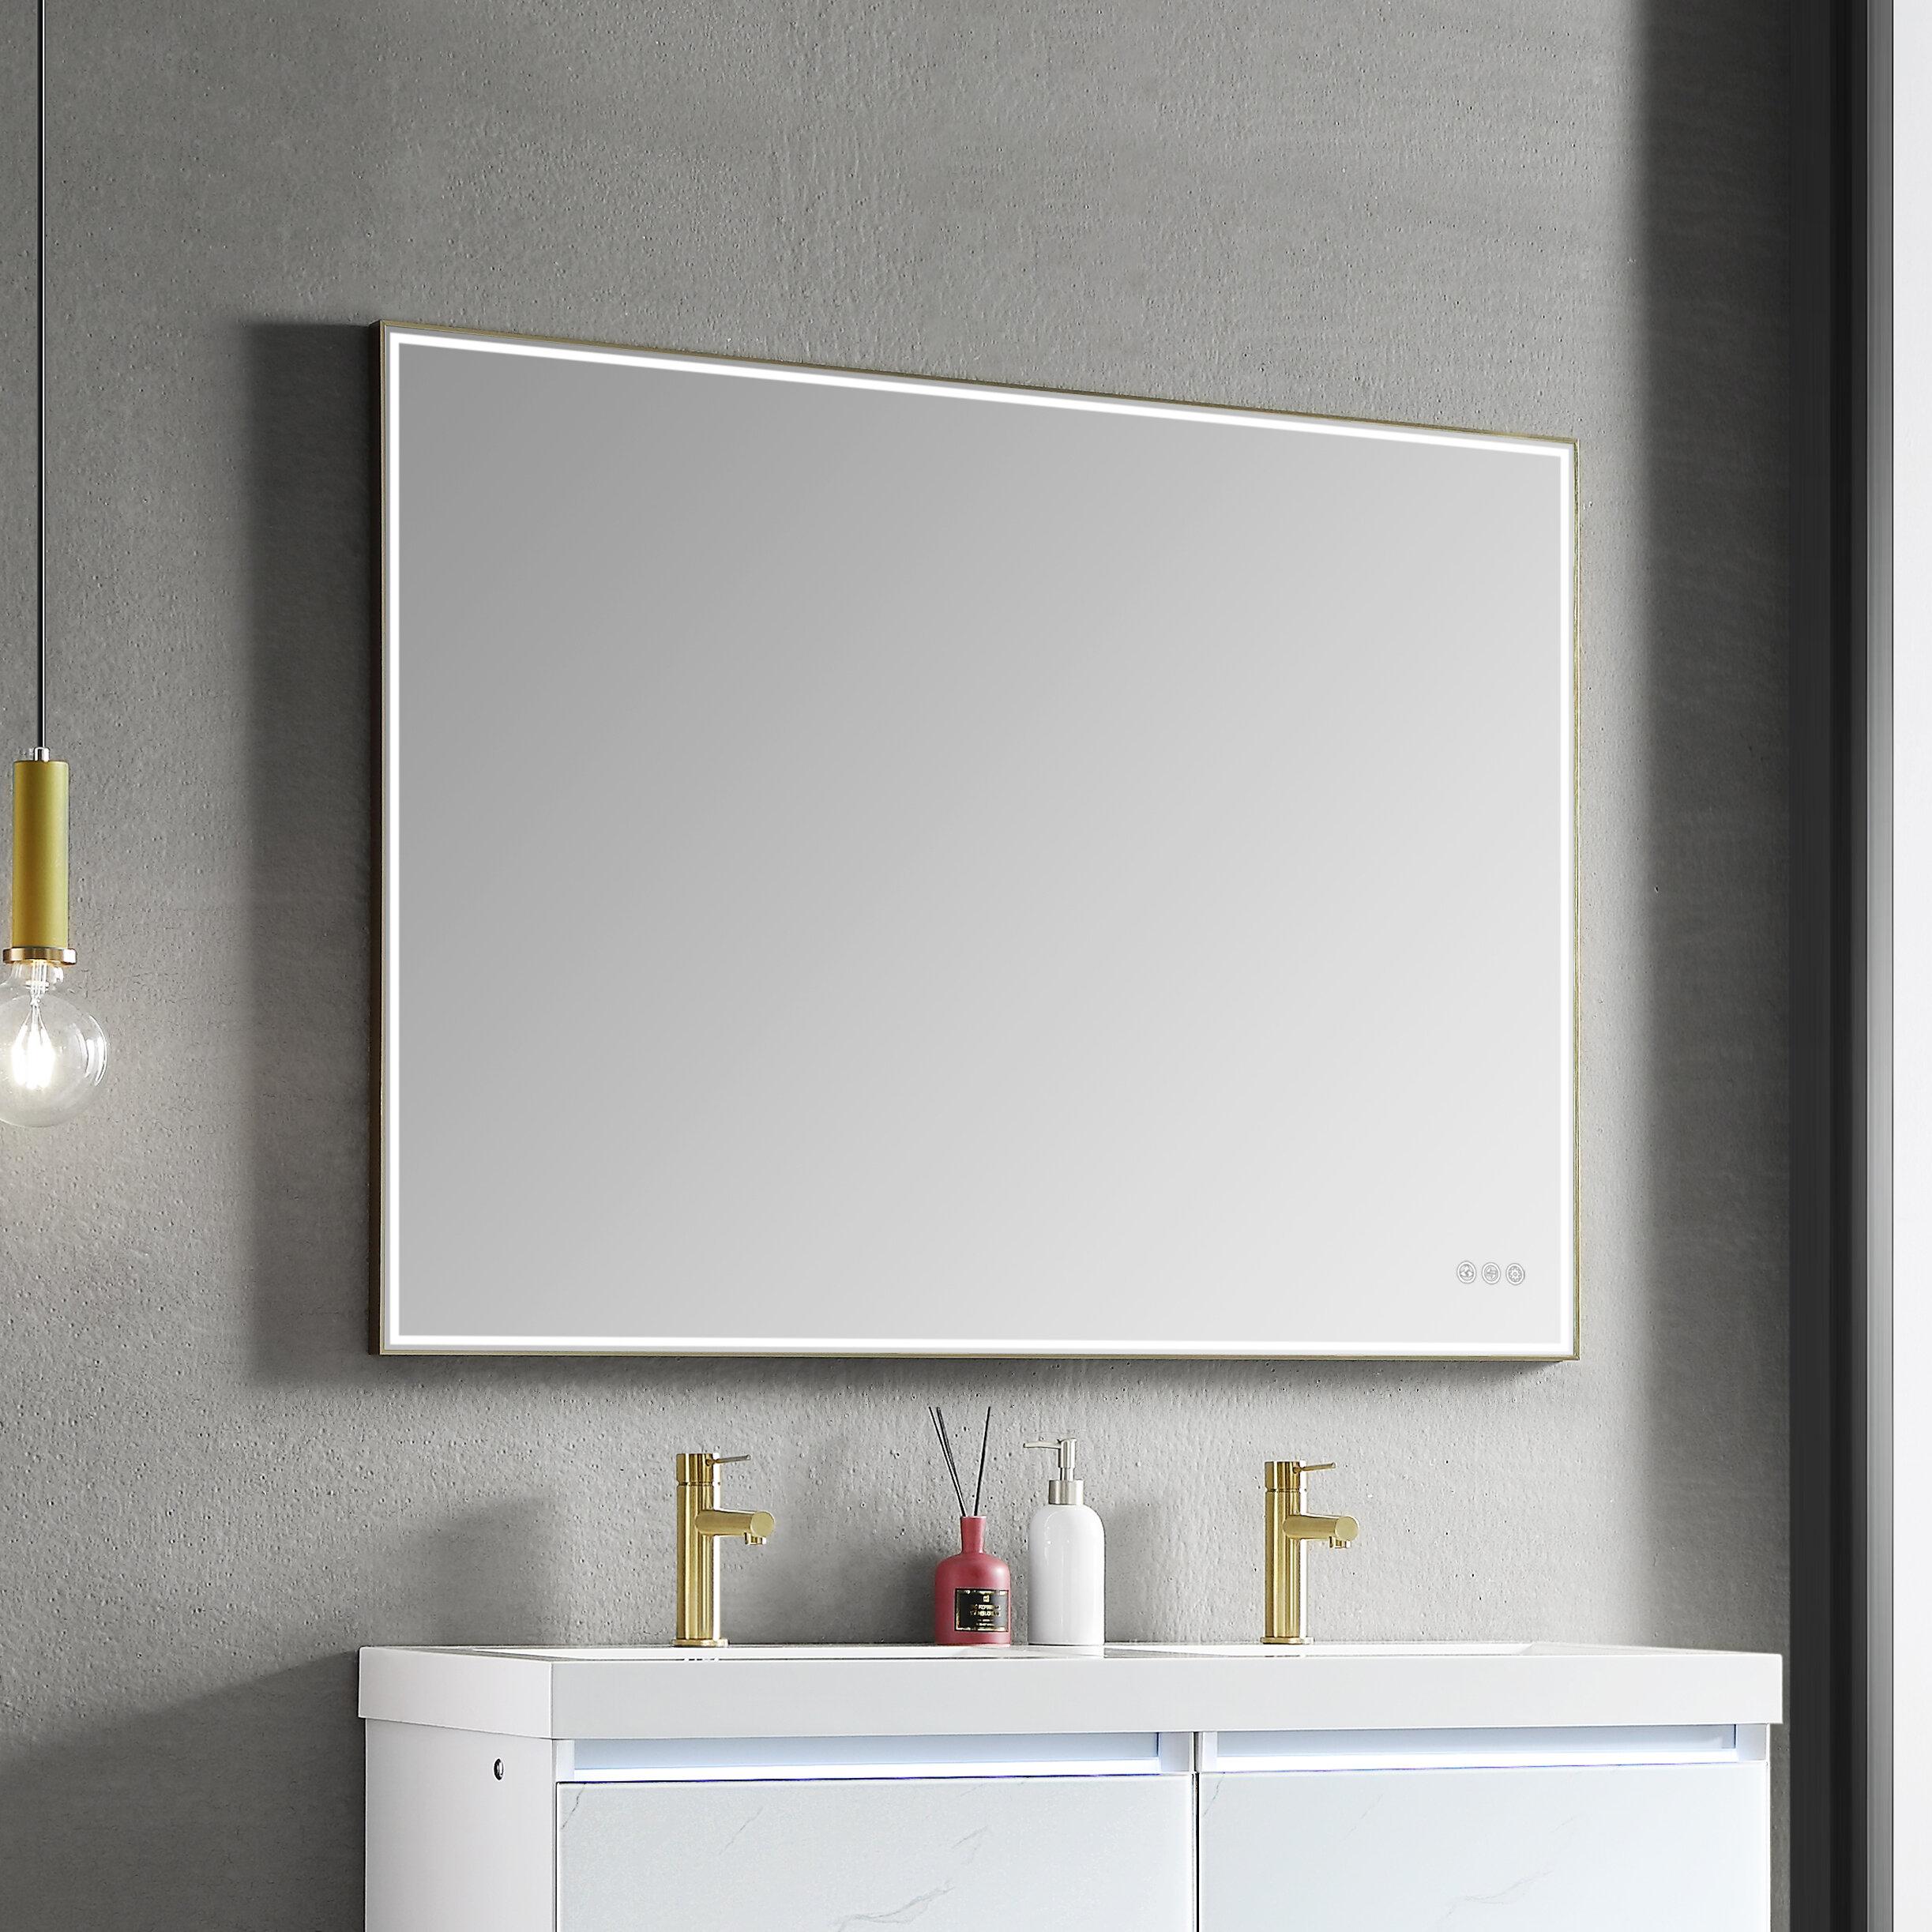 Large Bathroom Mirrors You Ll Love In 2021 Wayfair